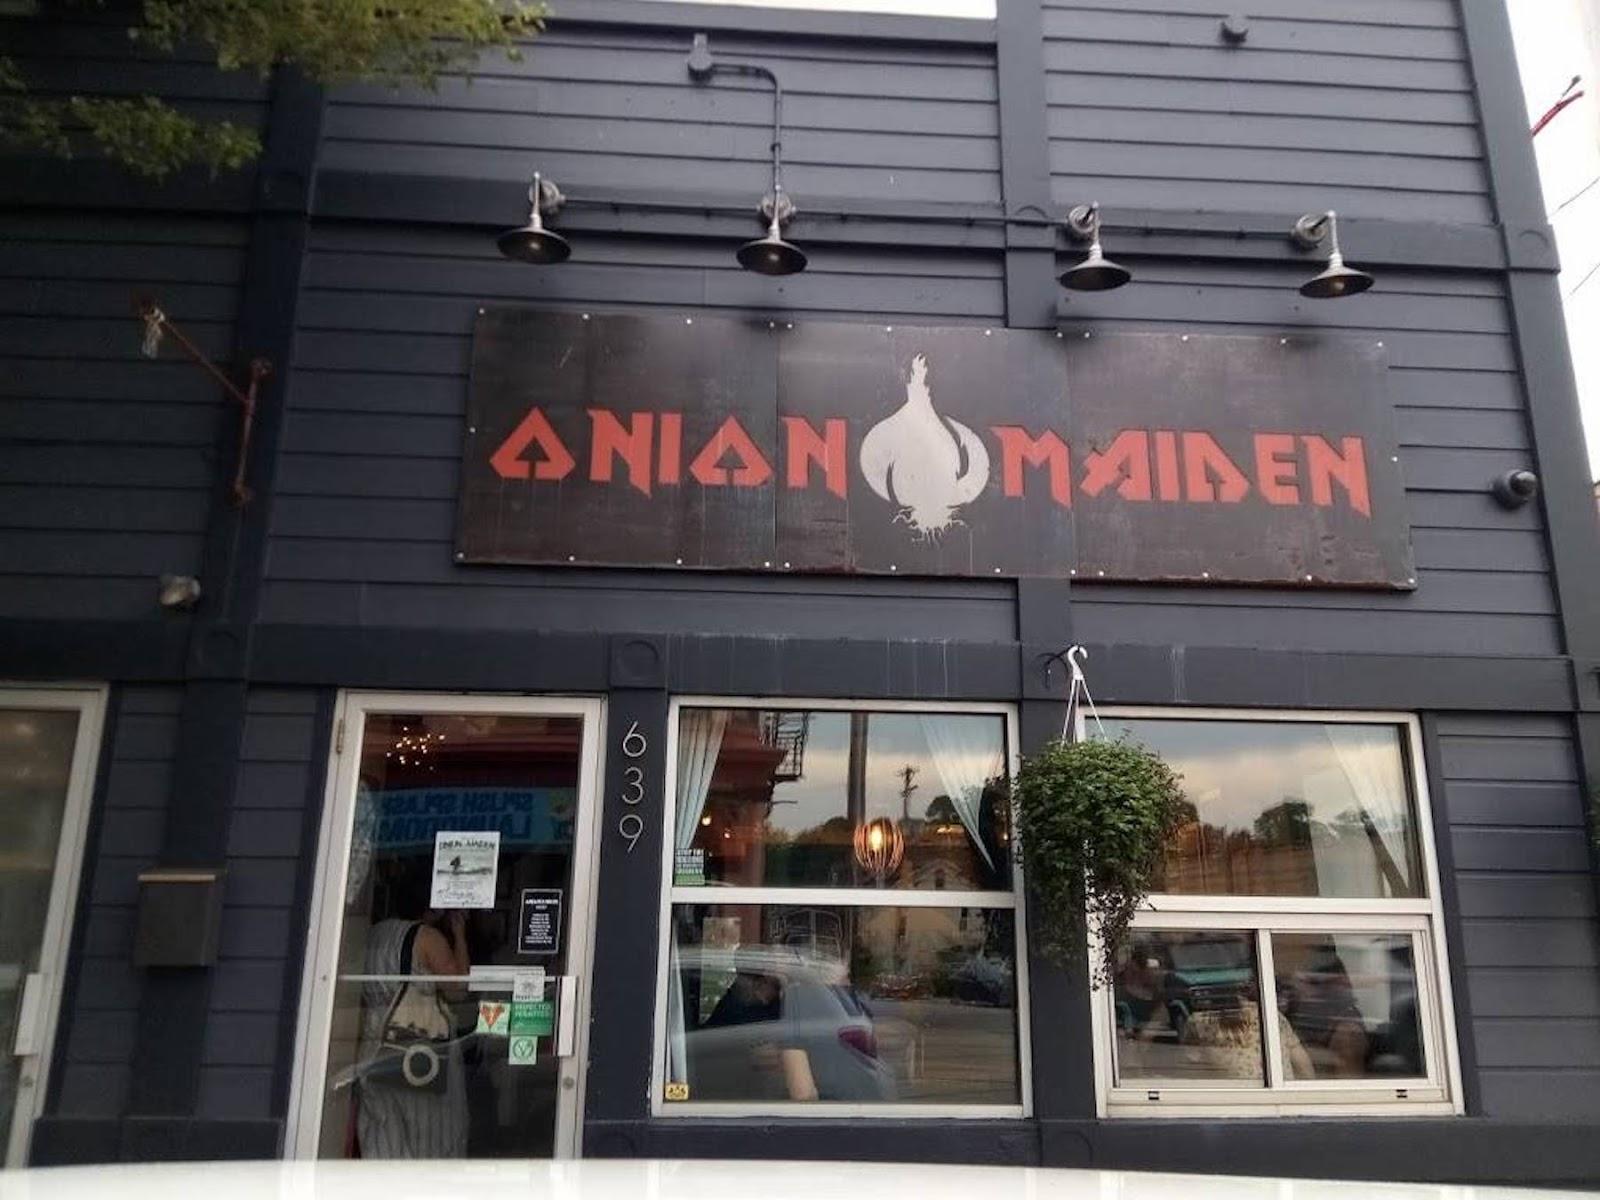 Onion Maiden storefront